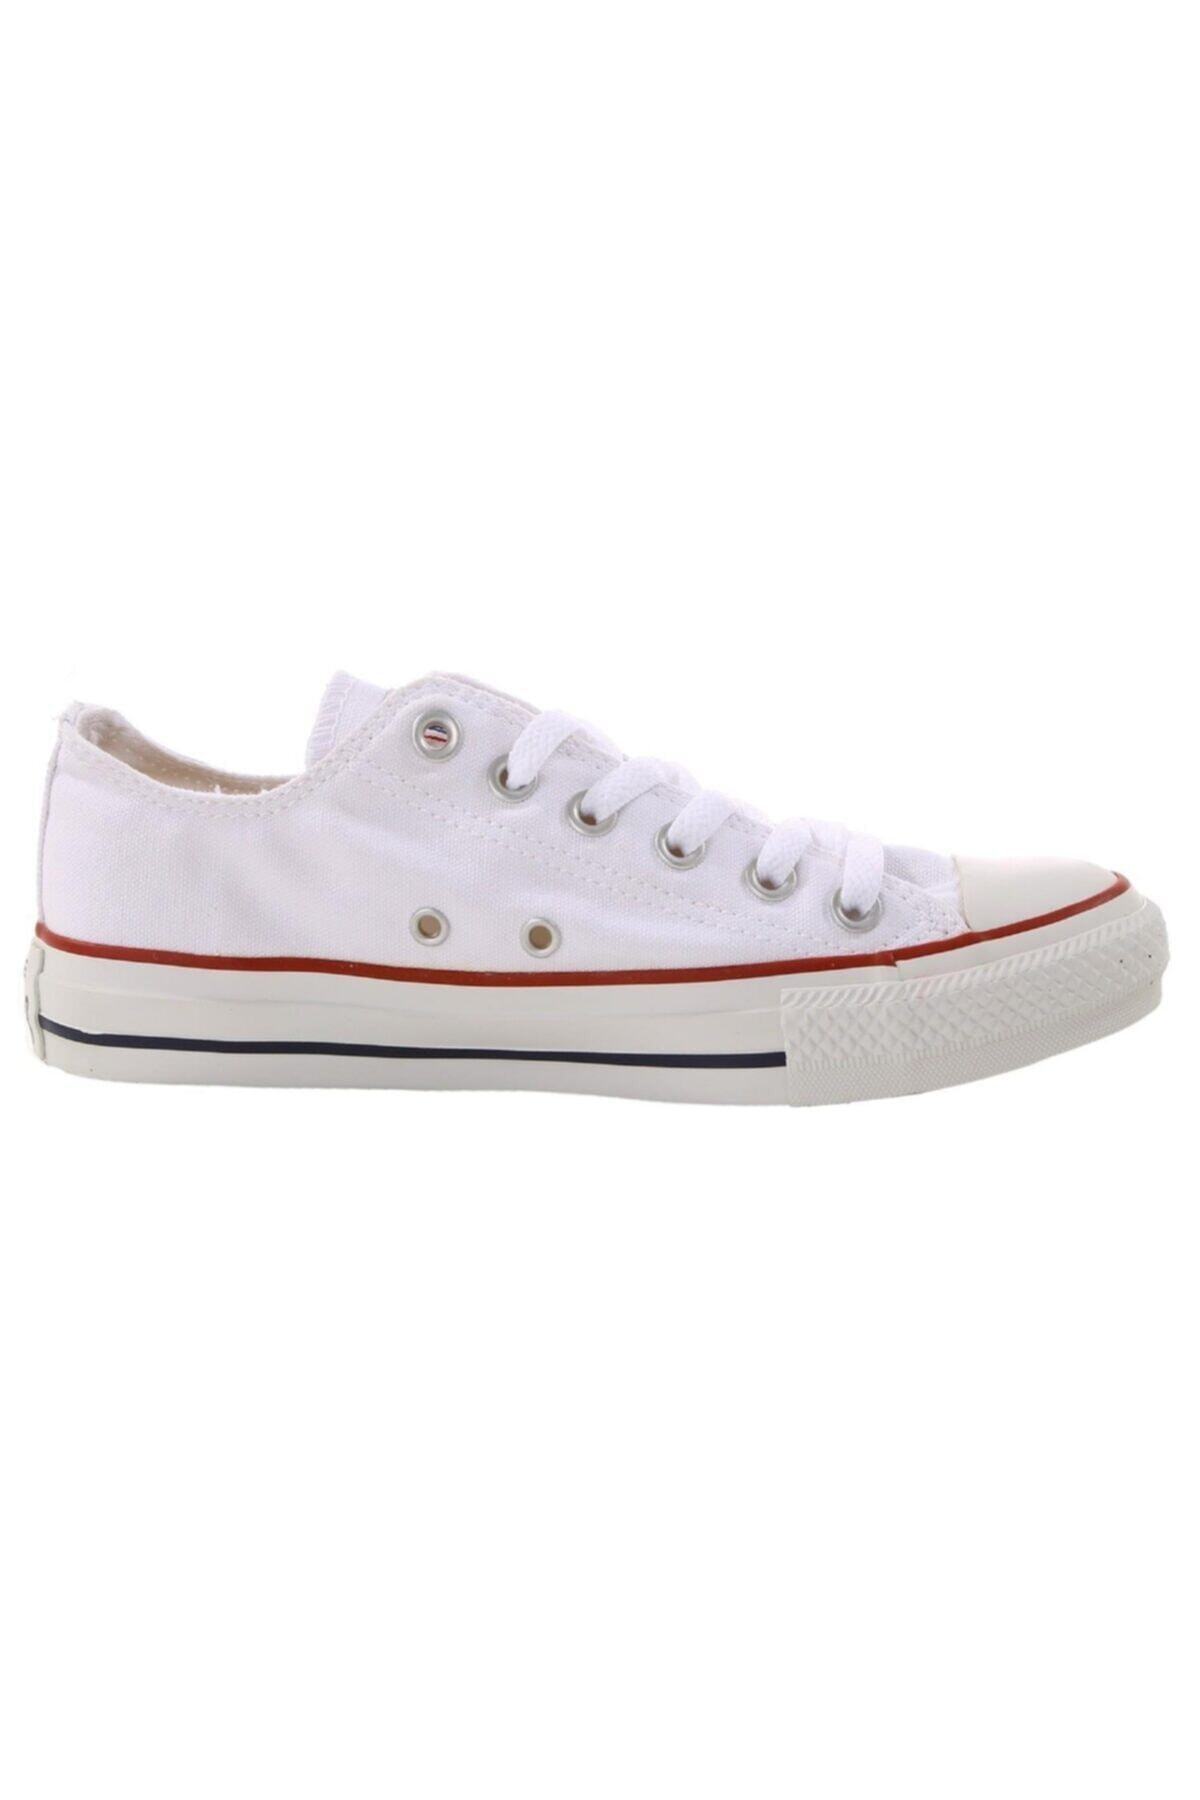 converse Kadın Beyaz Sneaker M7652c Chuck Taylor All Star Optıcal White Canvas 1